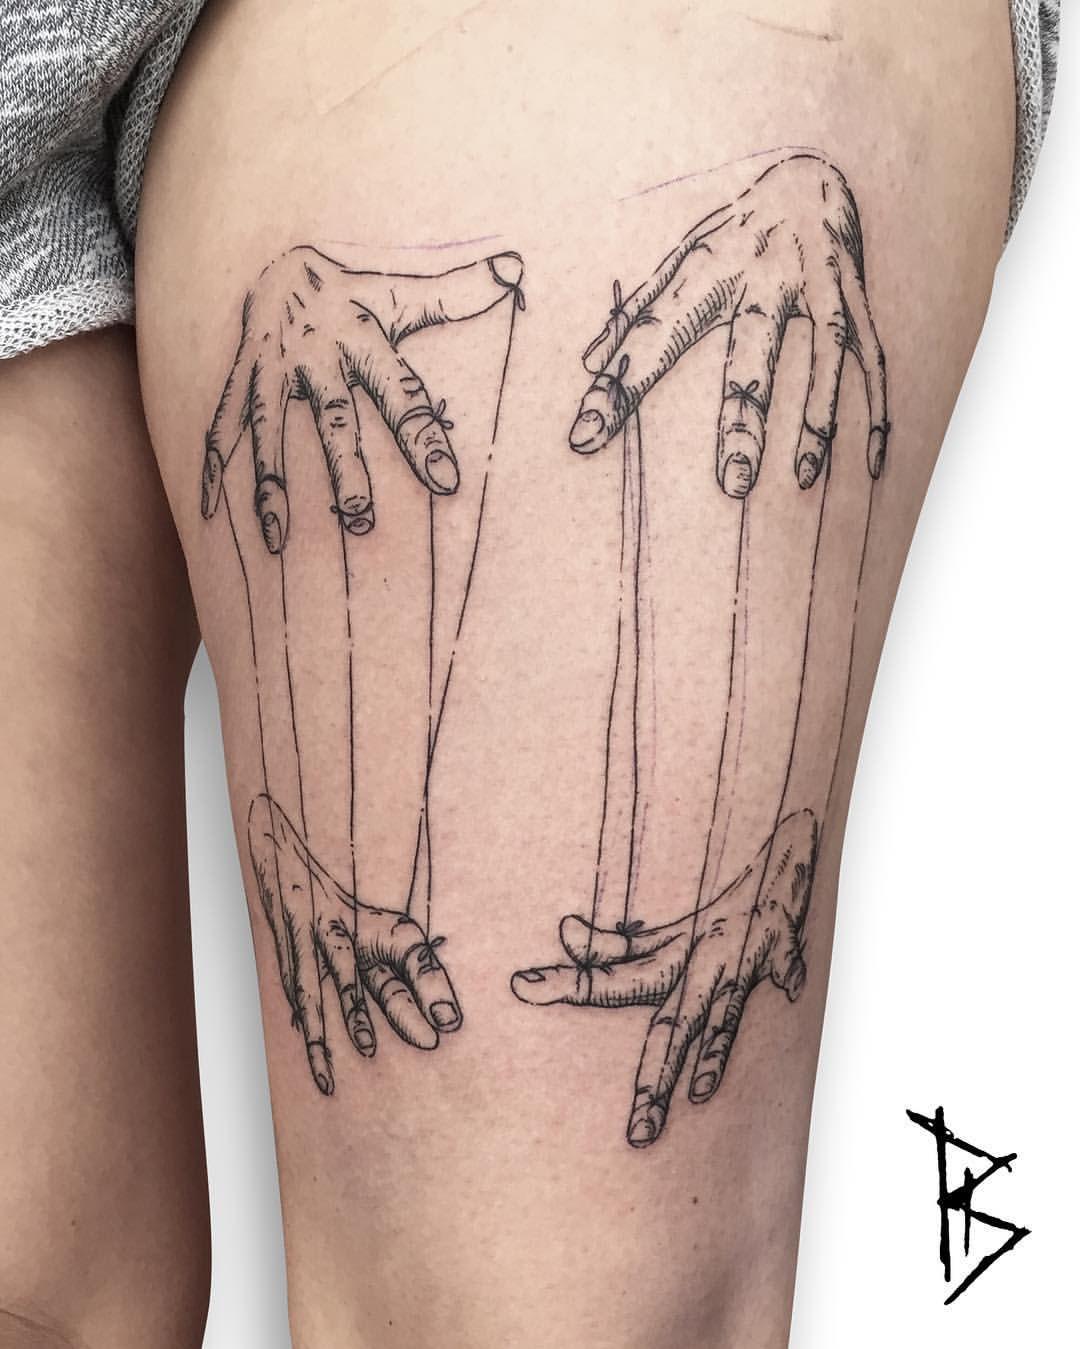 by Lebeuf Tattoo